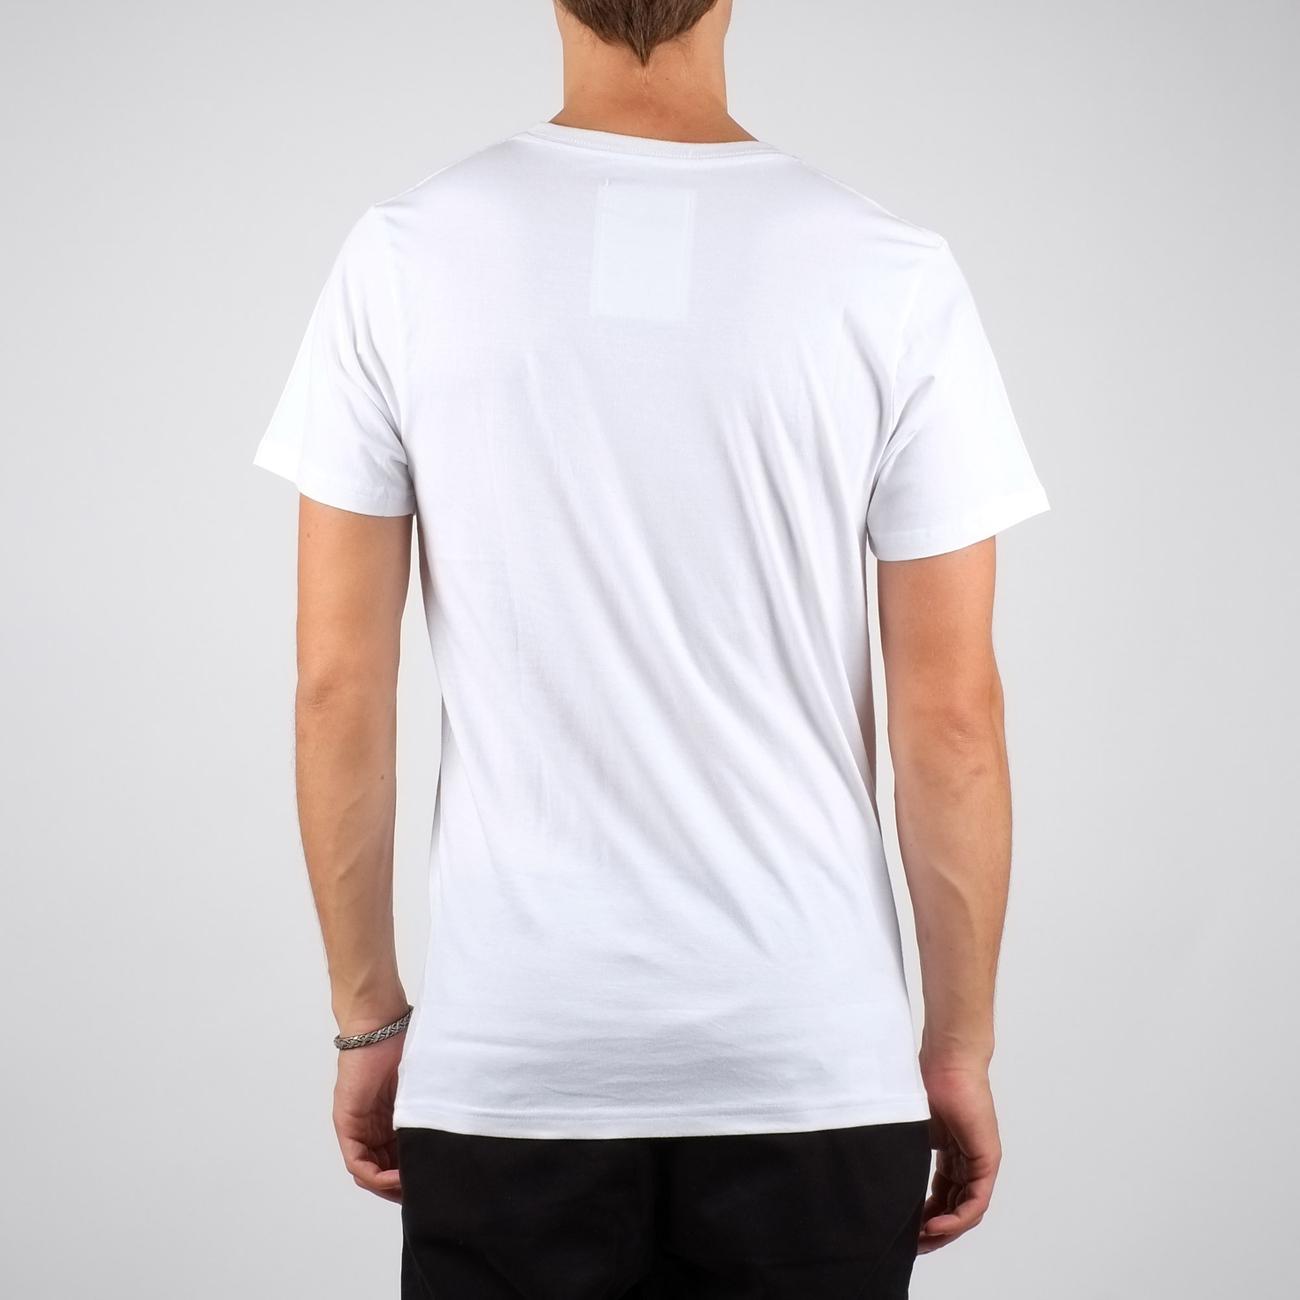 Stockholm T-shirt Vinyl Collection